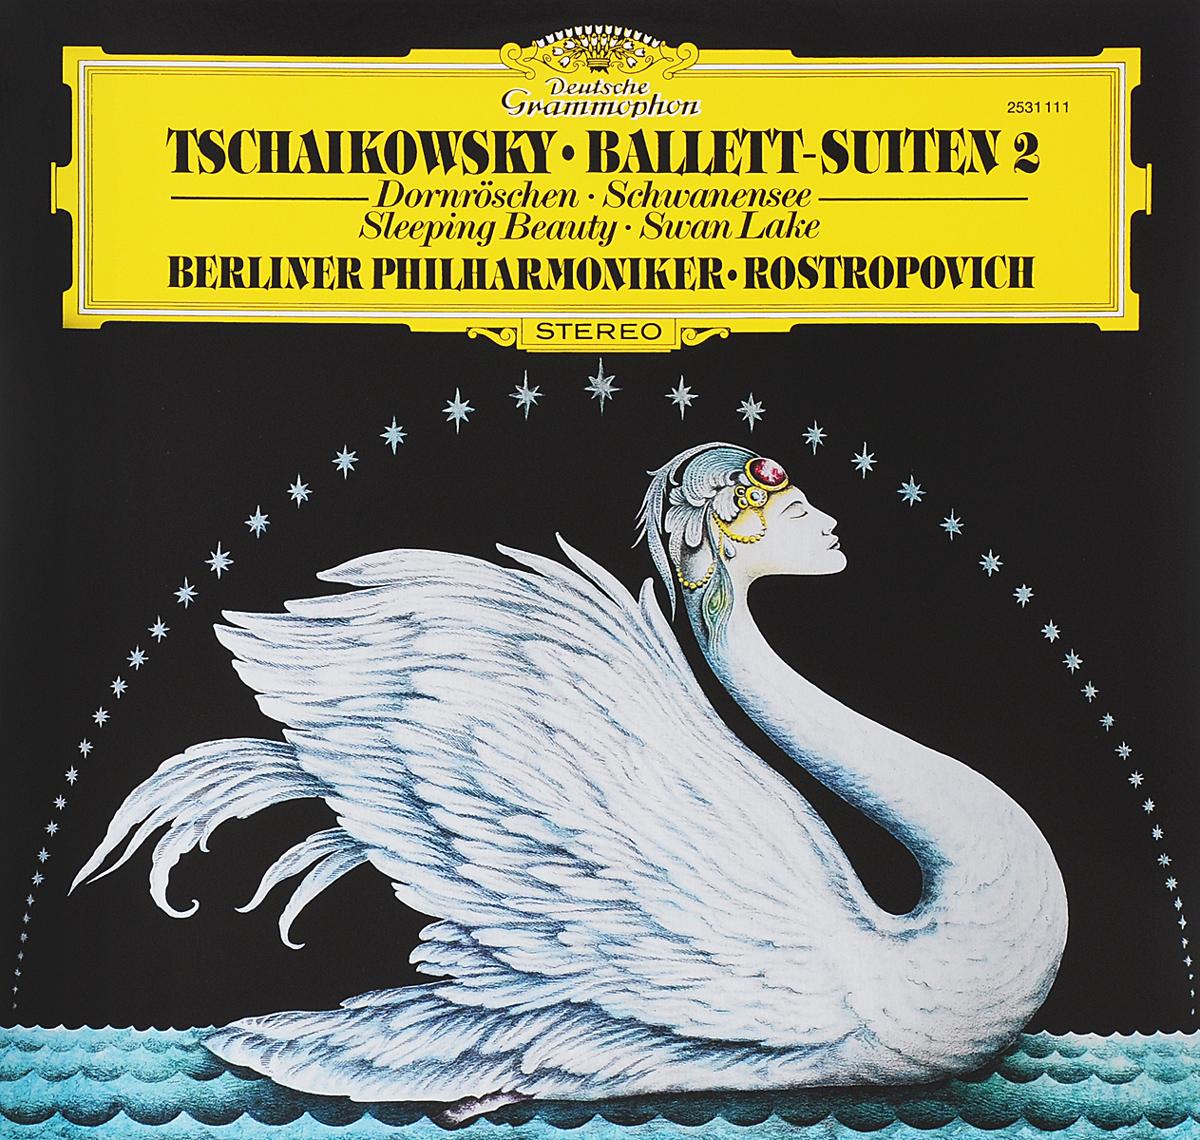 Мстислав Ростропович,Леон Спирер,Эберхард Финк,Berliner Philharmoniker Rostropovich. Tchaikowsky. Ballet-Suiten II (LP)